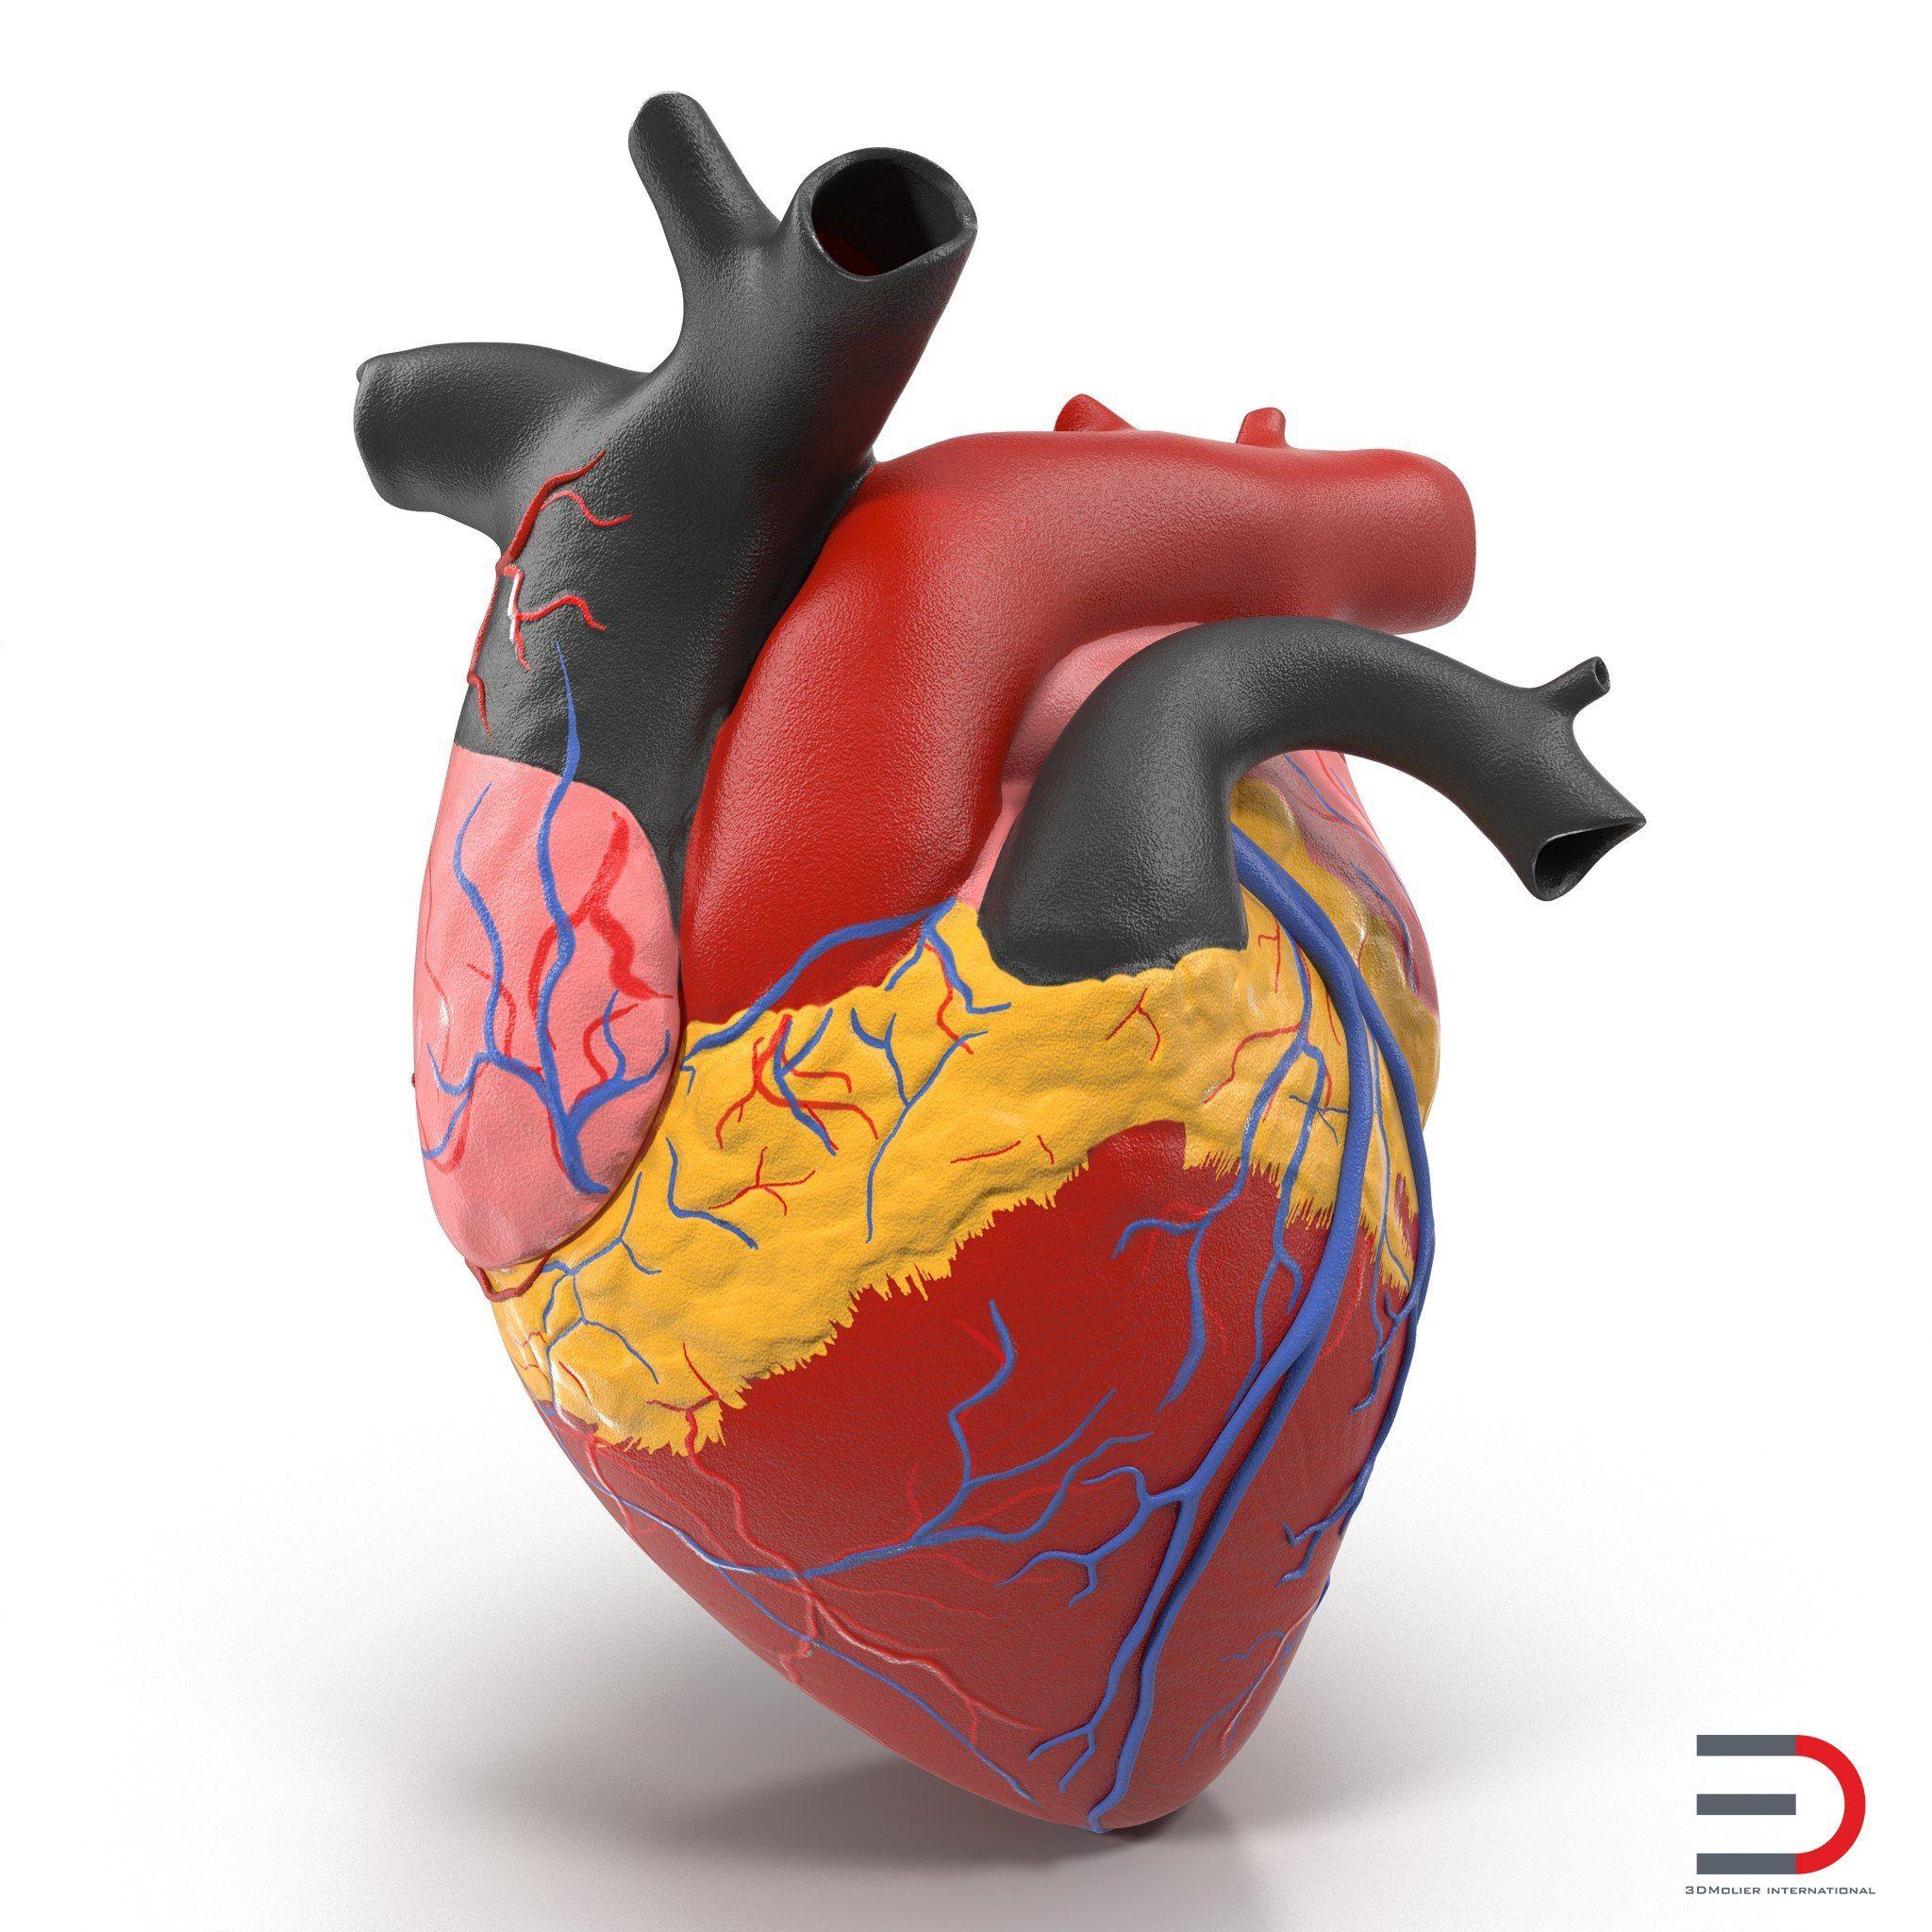 Anatomy Heart Medical Plastic Model | 3d models of Medical Equipment ...